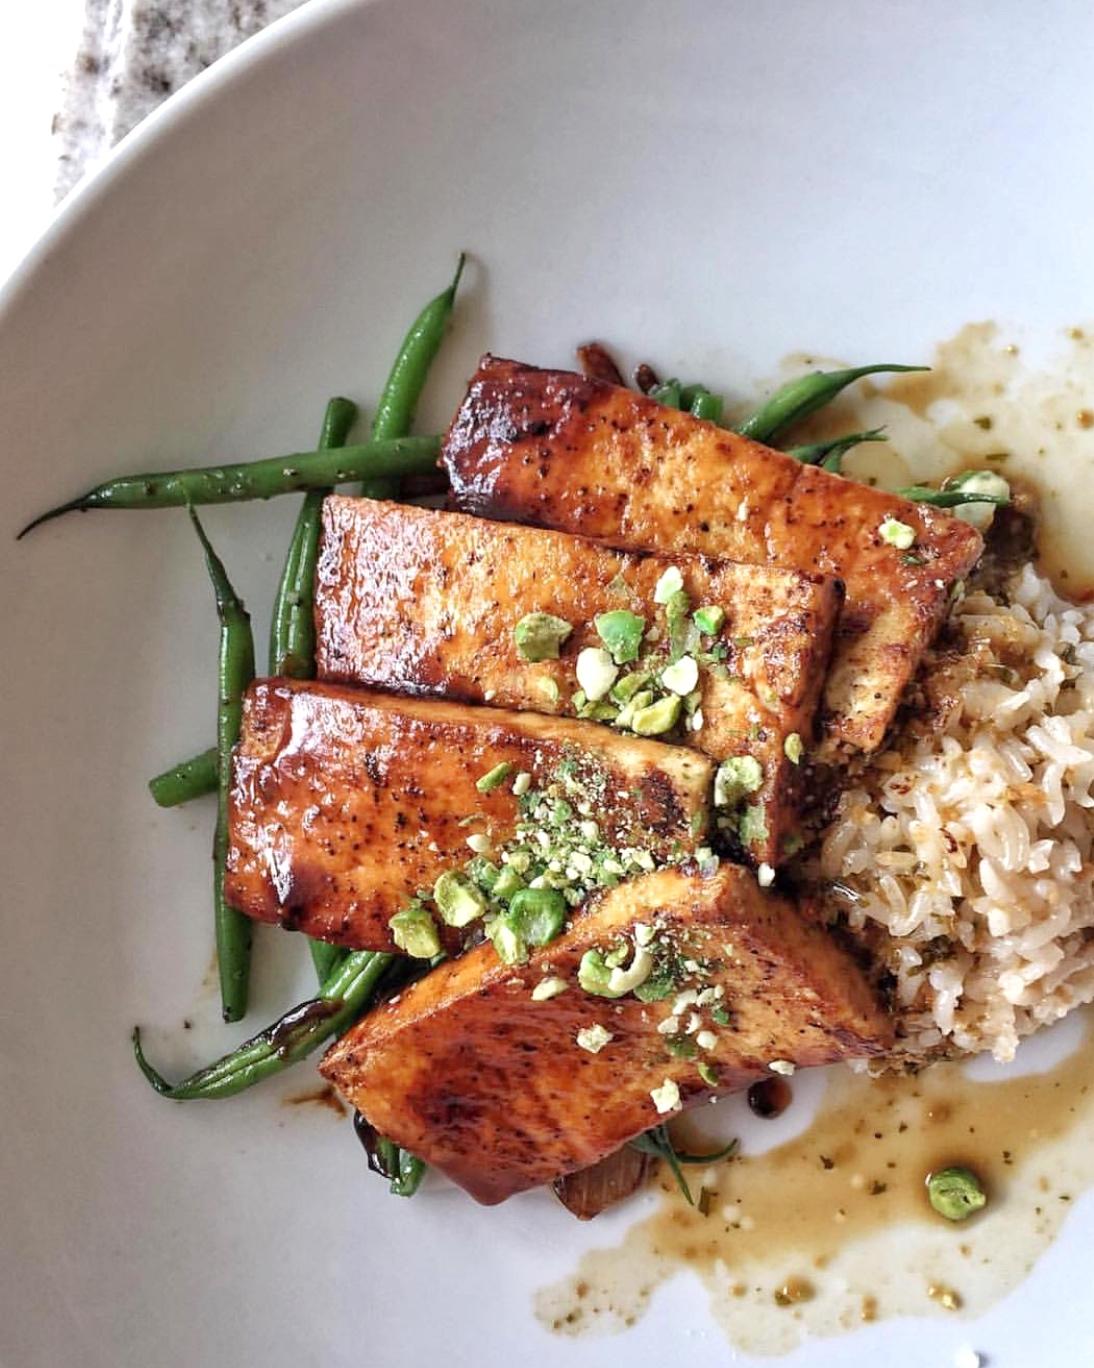 Vegan at Walt Disney World - Grand Floridian Cafe - Miso Glazed Tofu